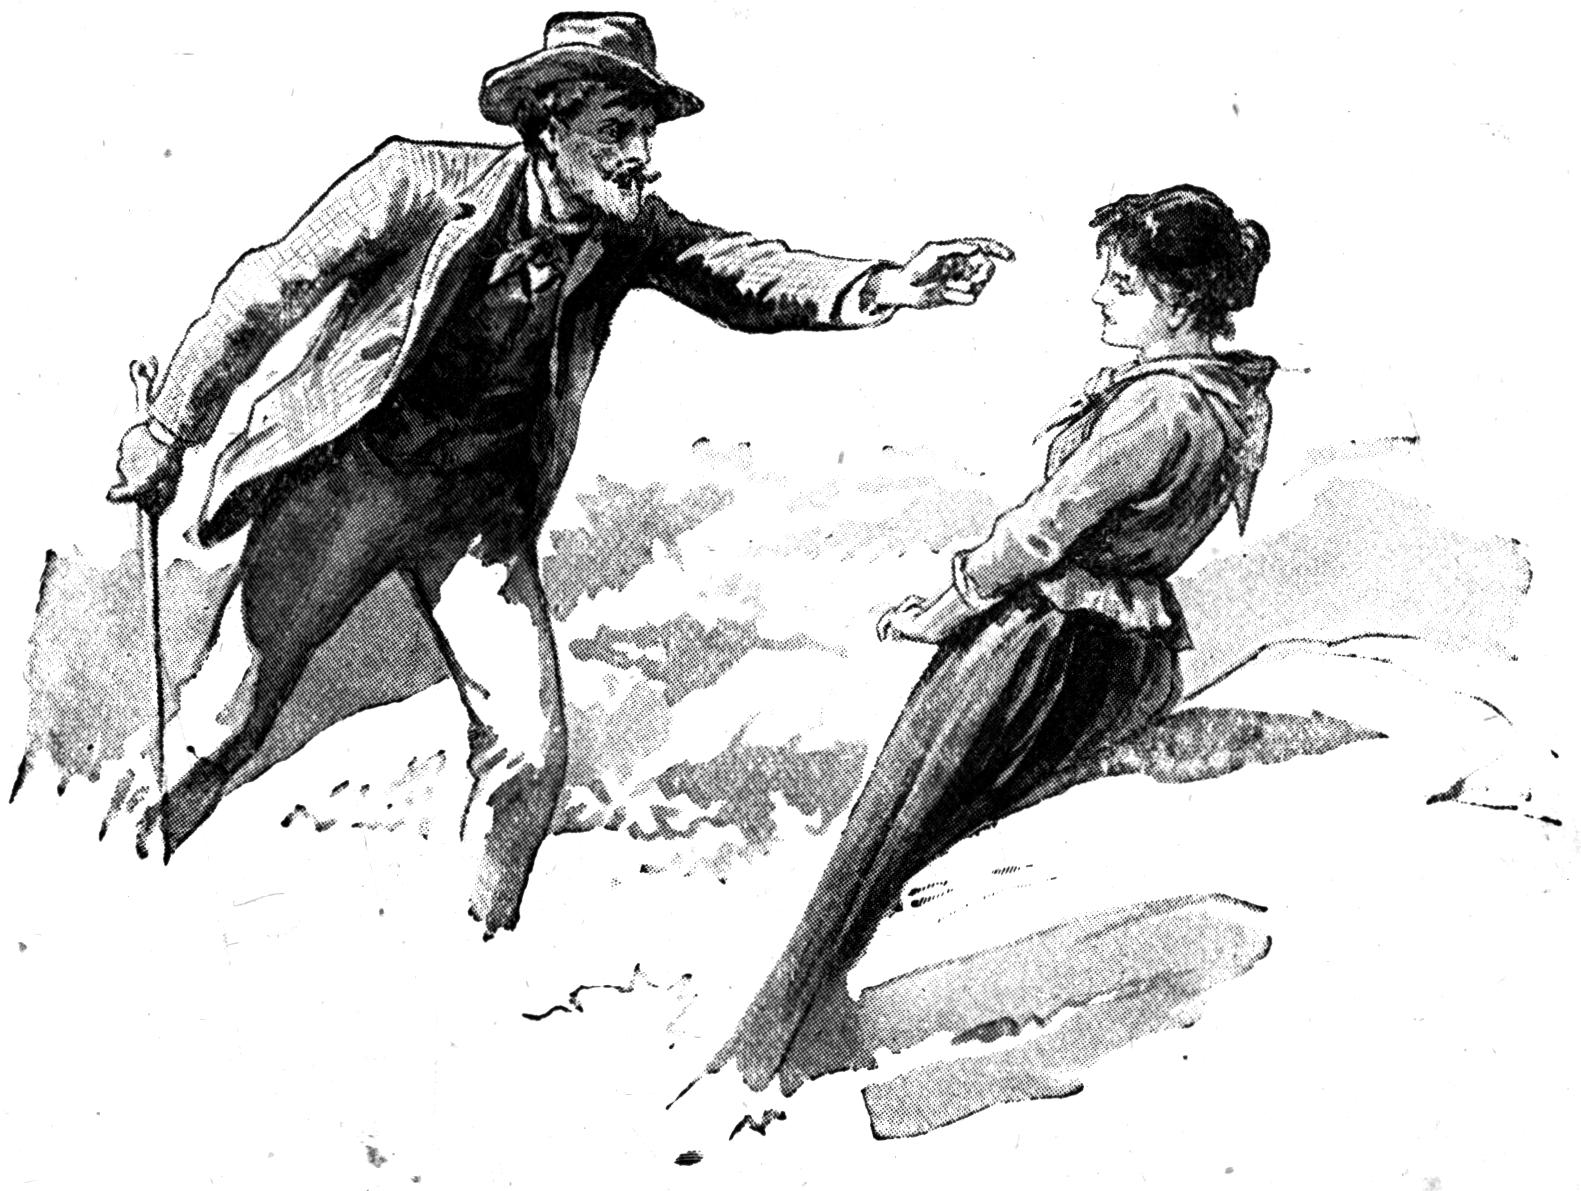 File:Maid of treppi, pg 69--The Strand Magazine, vol 1, no